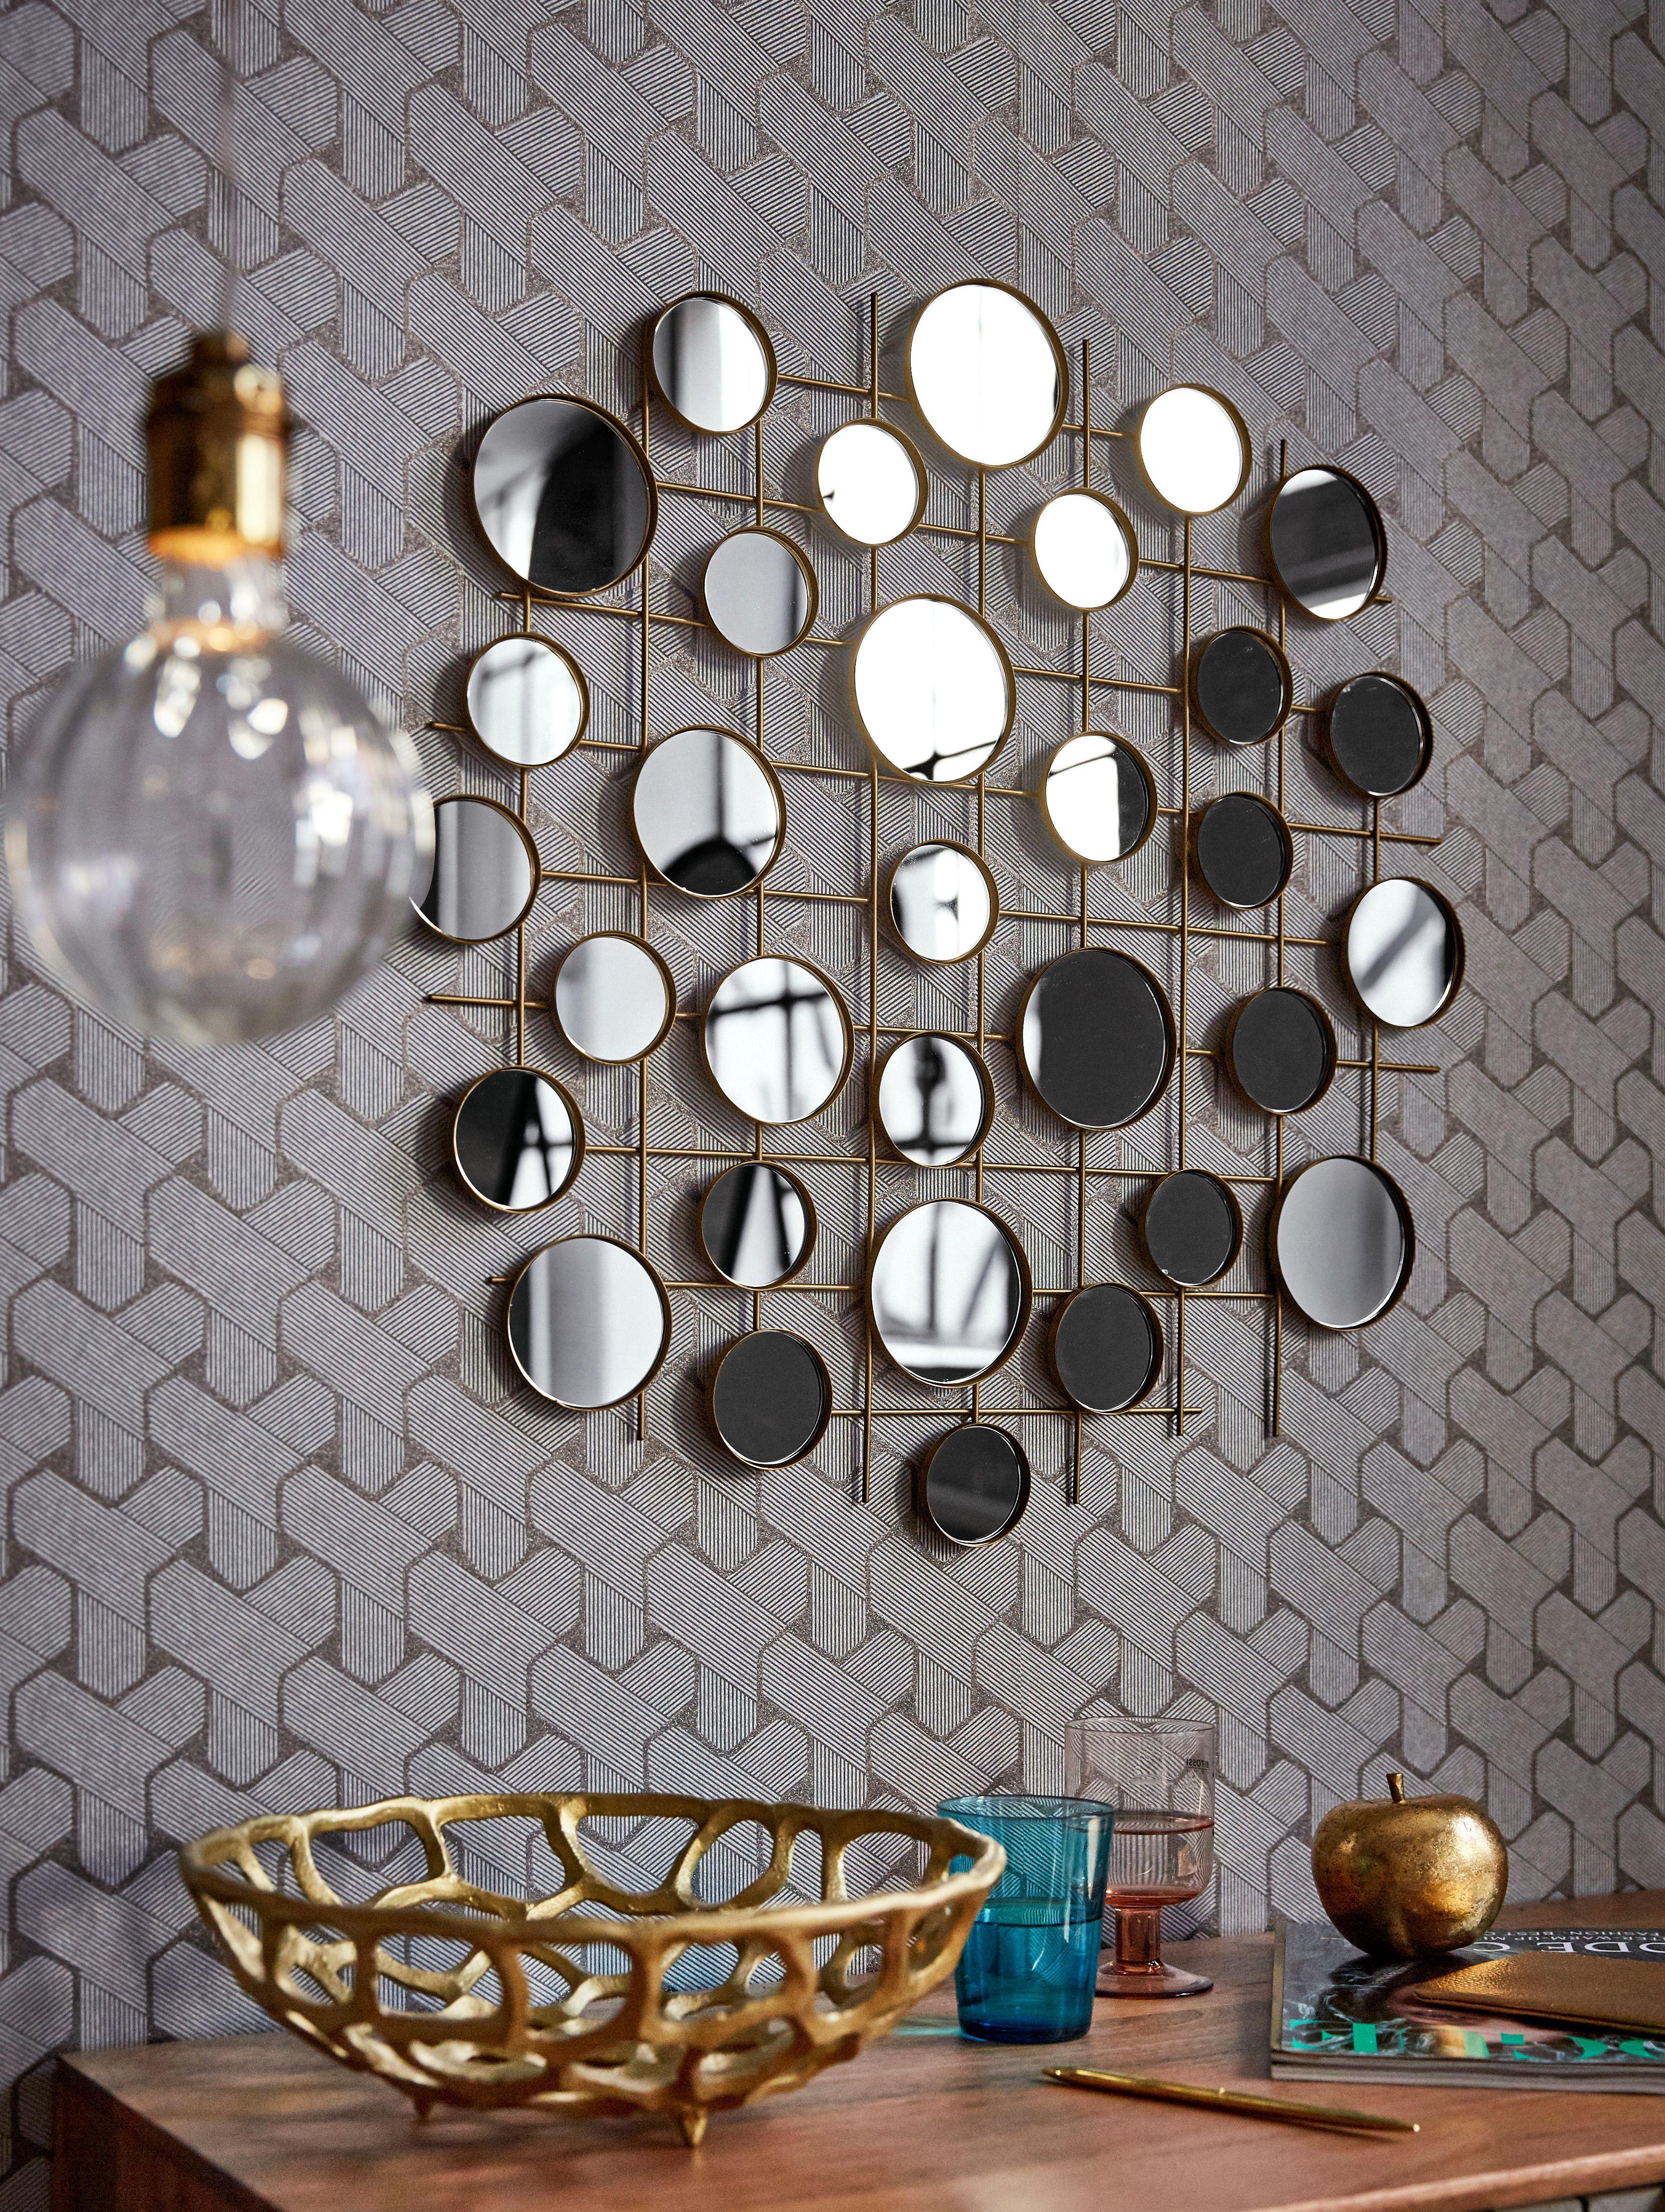 mehr ist schon deko trends wandschmuck wandobjekt metall gold wanddekoration silberfarben